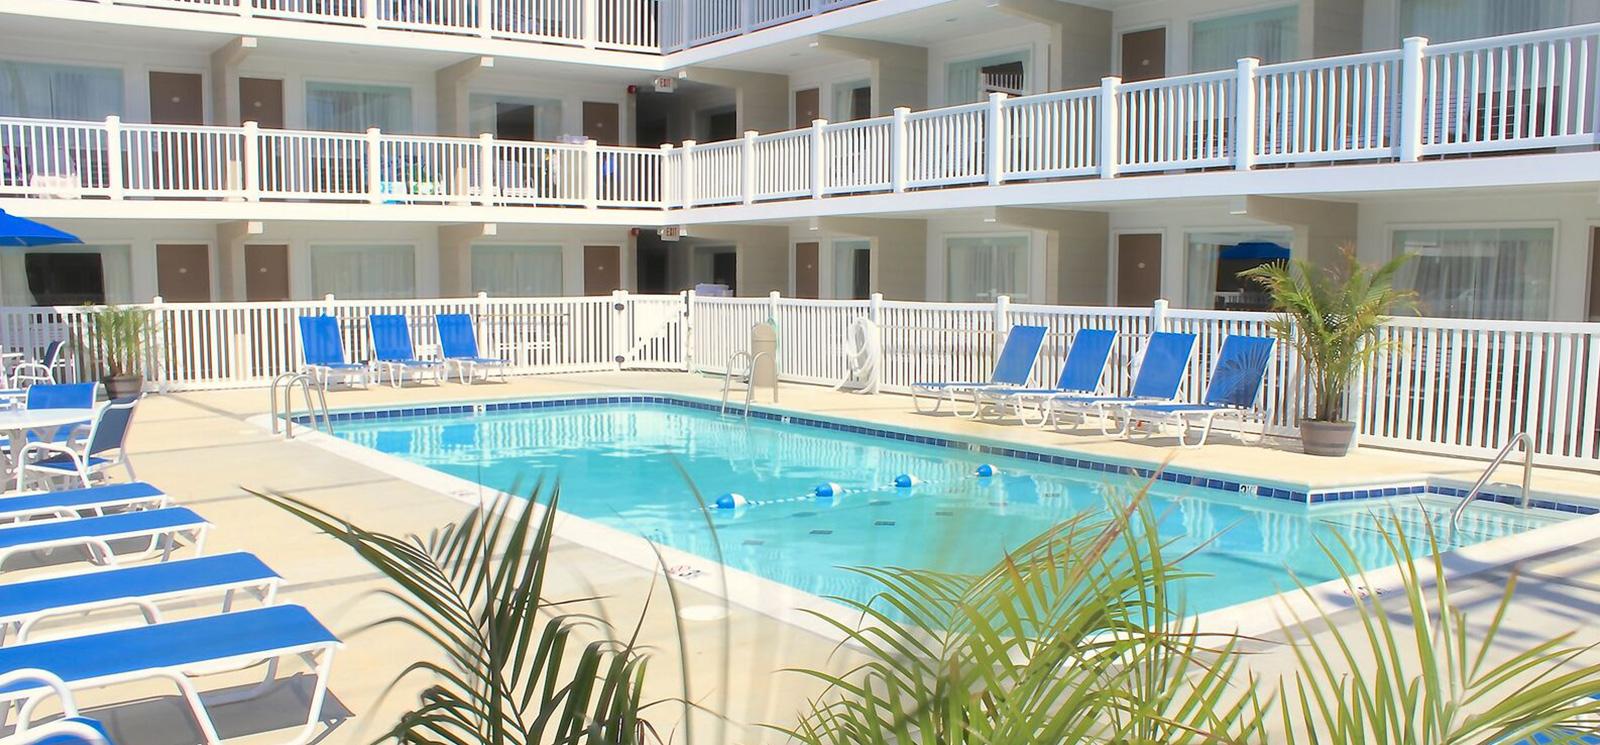 The Oceanus Hotel Rehoboth Beach, Delaware